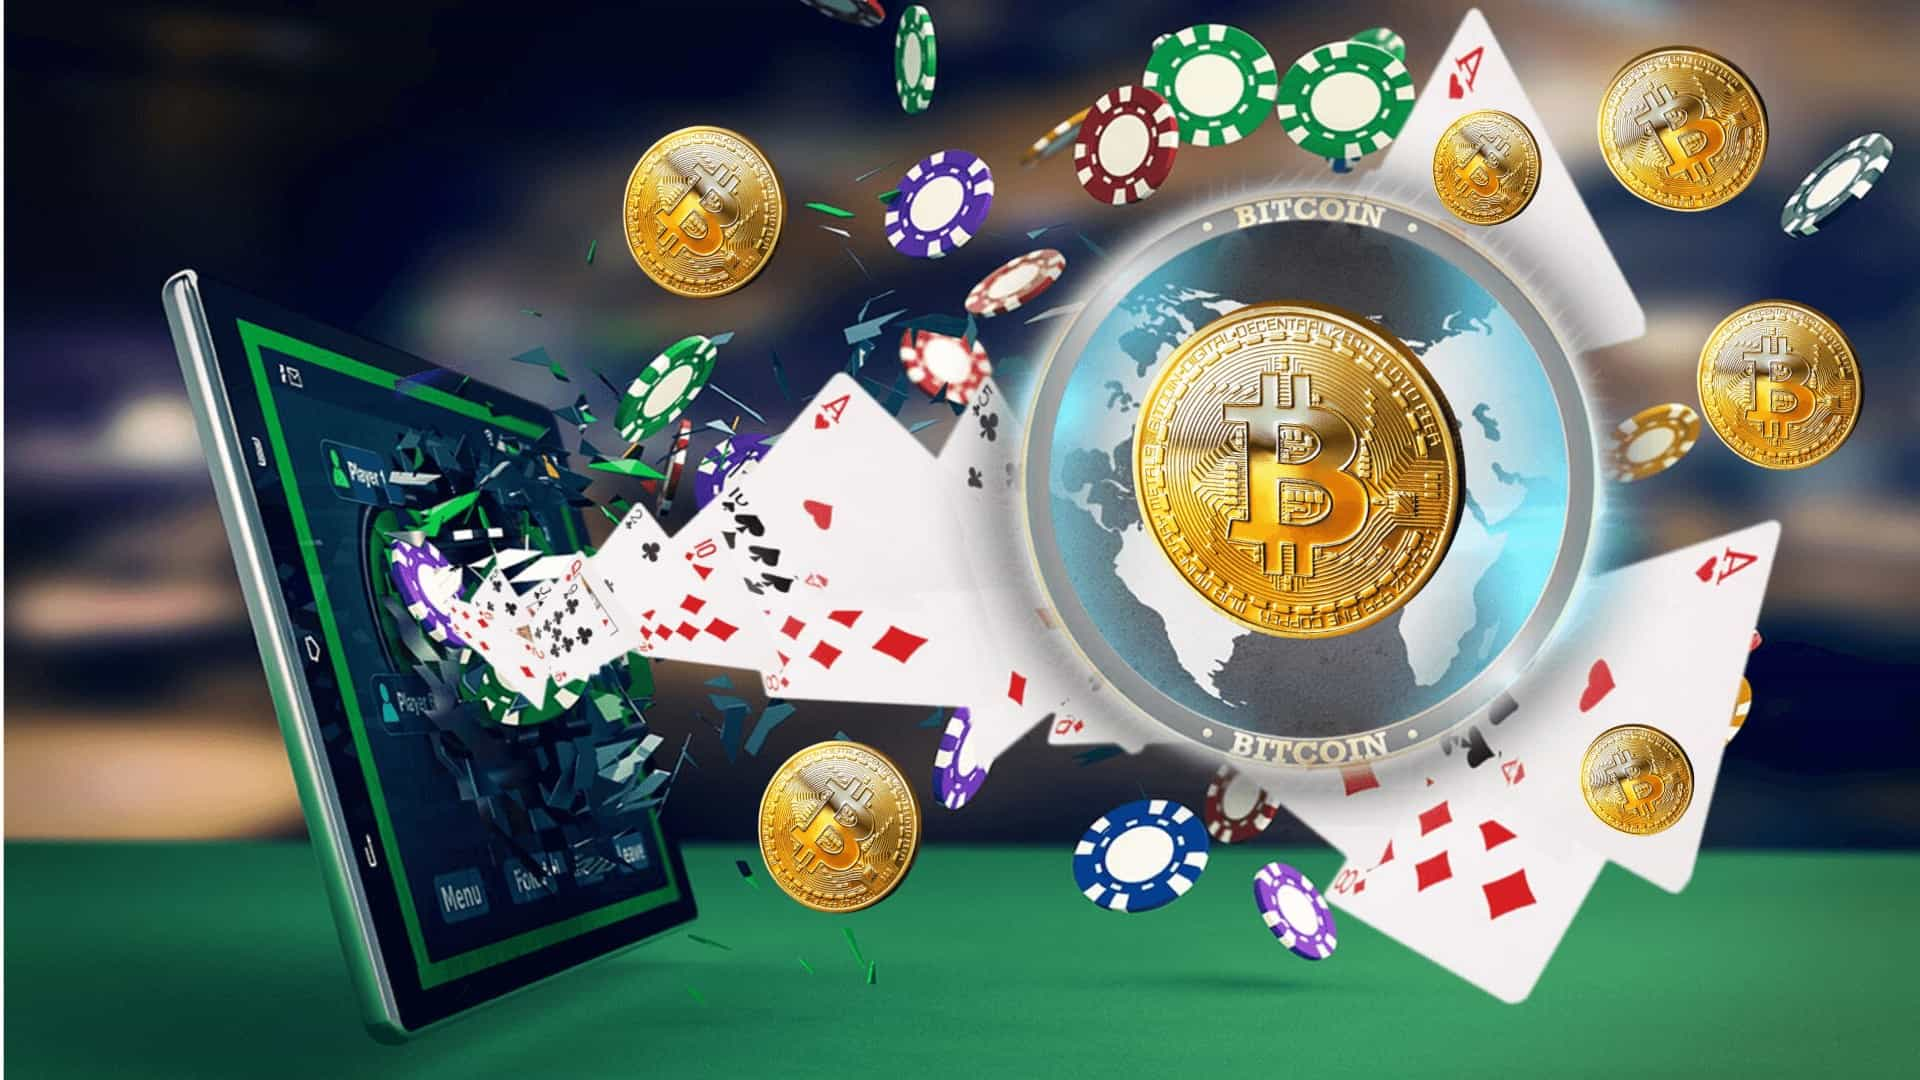 Exciting Online Slot Games Awaits at 918kiss